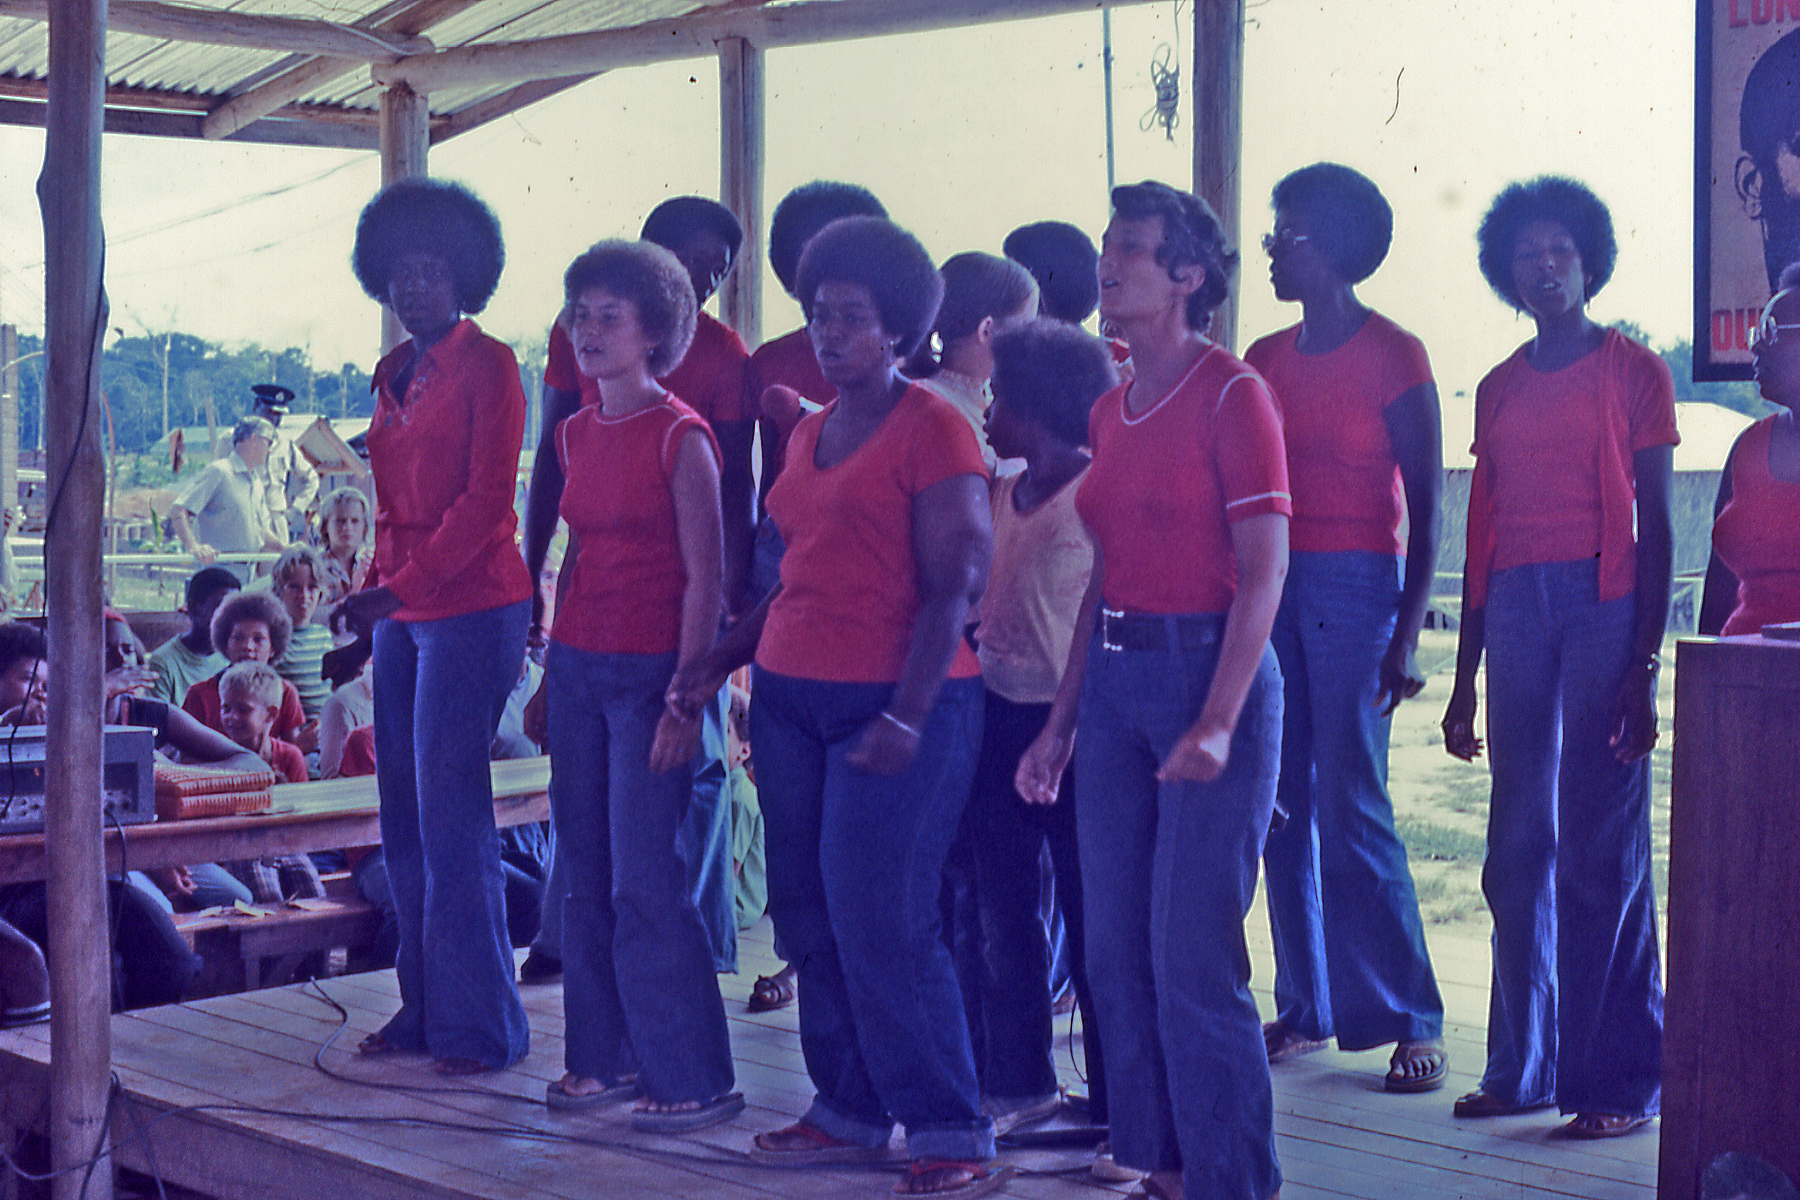 Laura Johnston Kohl (far right) performing in Jonestown 1978. Photo courtesy of Laura Johnston Kohl via Peoples Temple/Jonestown Gallery (Flickr)